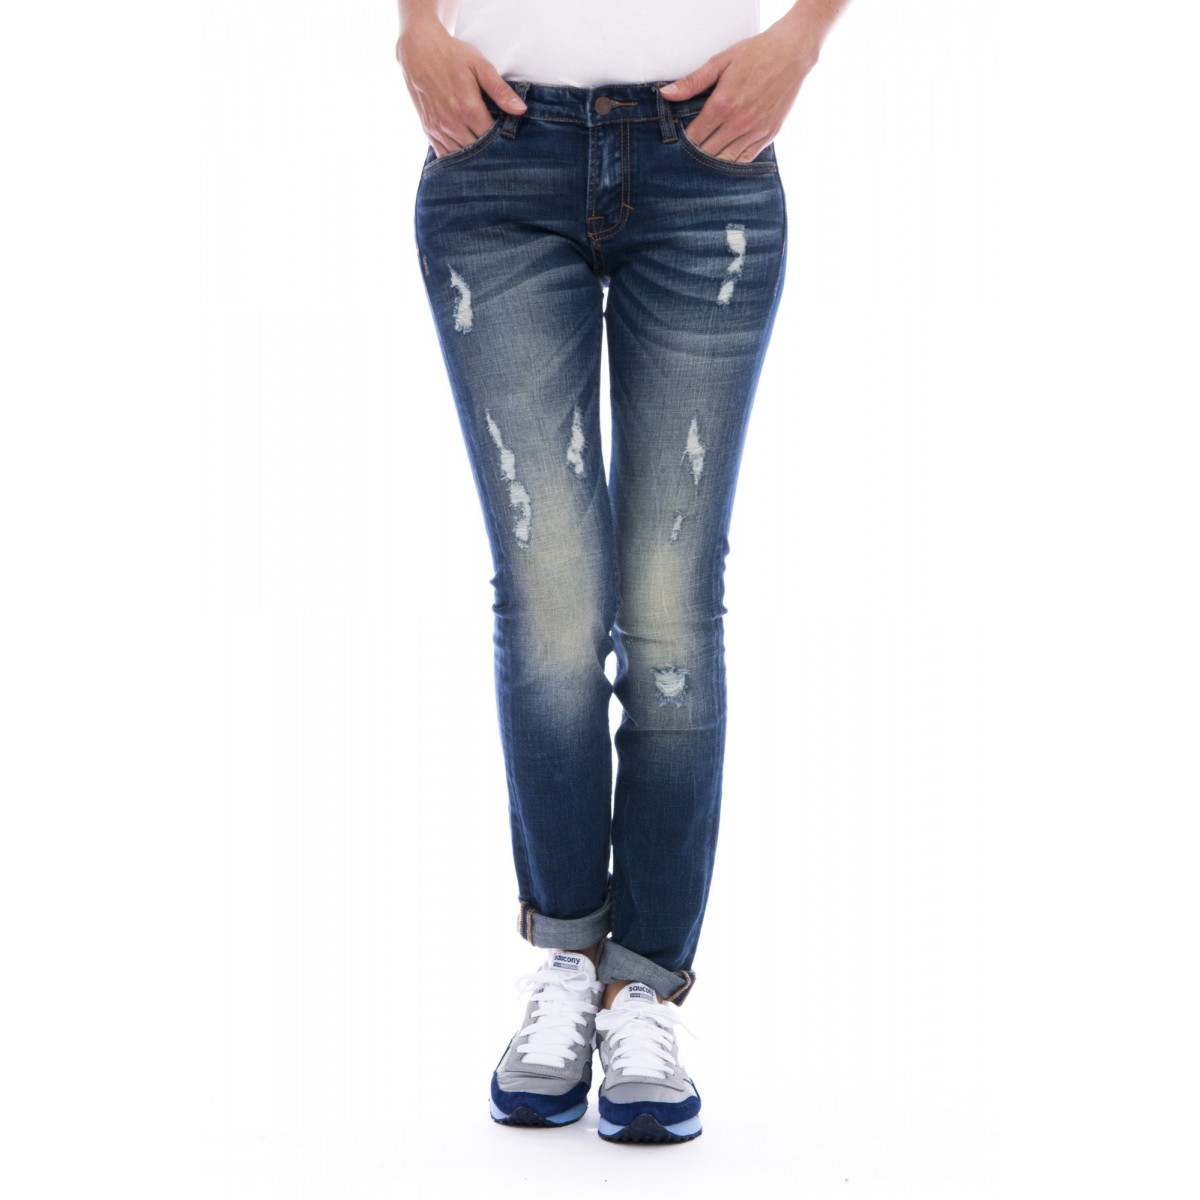 Jeans Sun 68 - 26275 jeans rotture